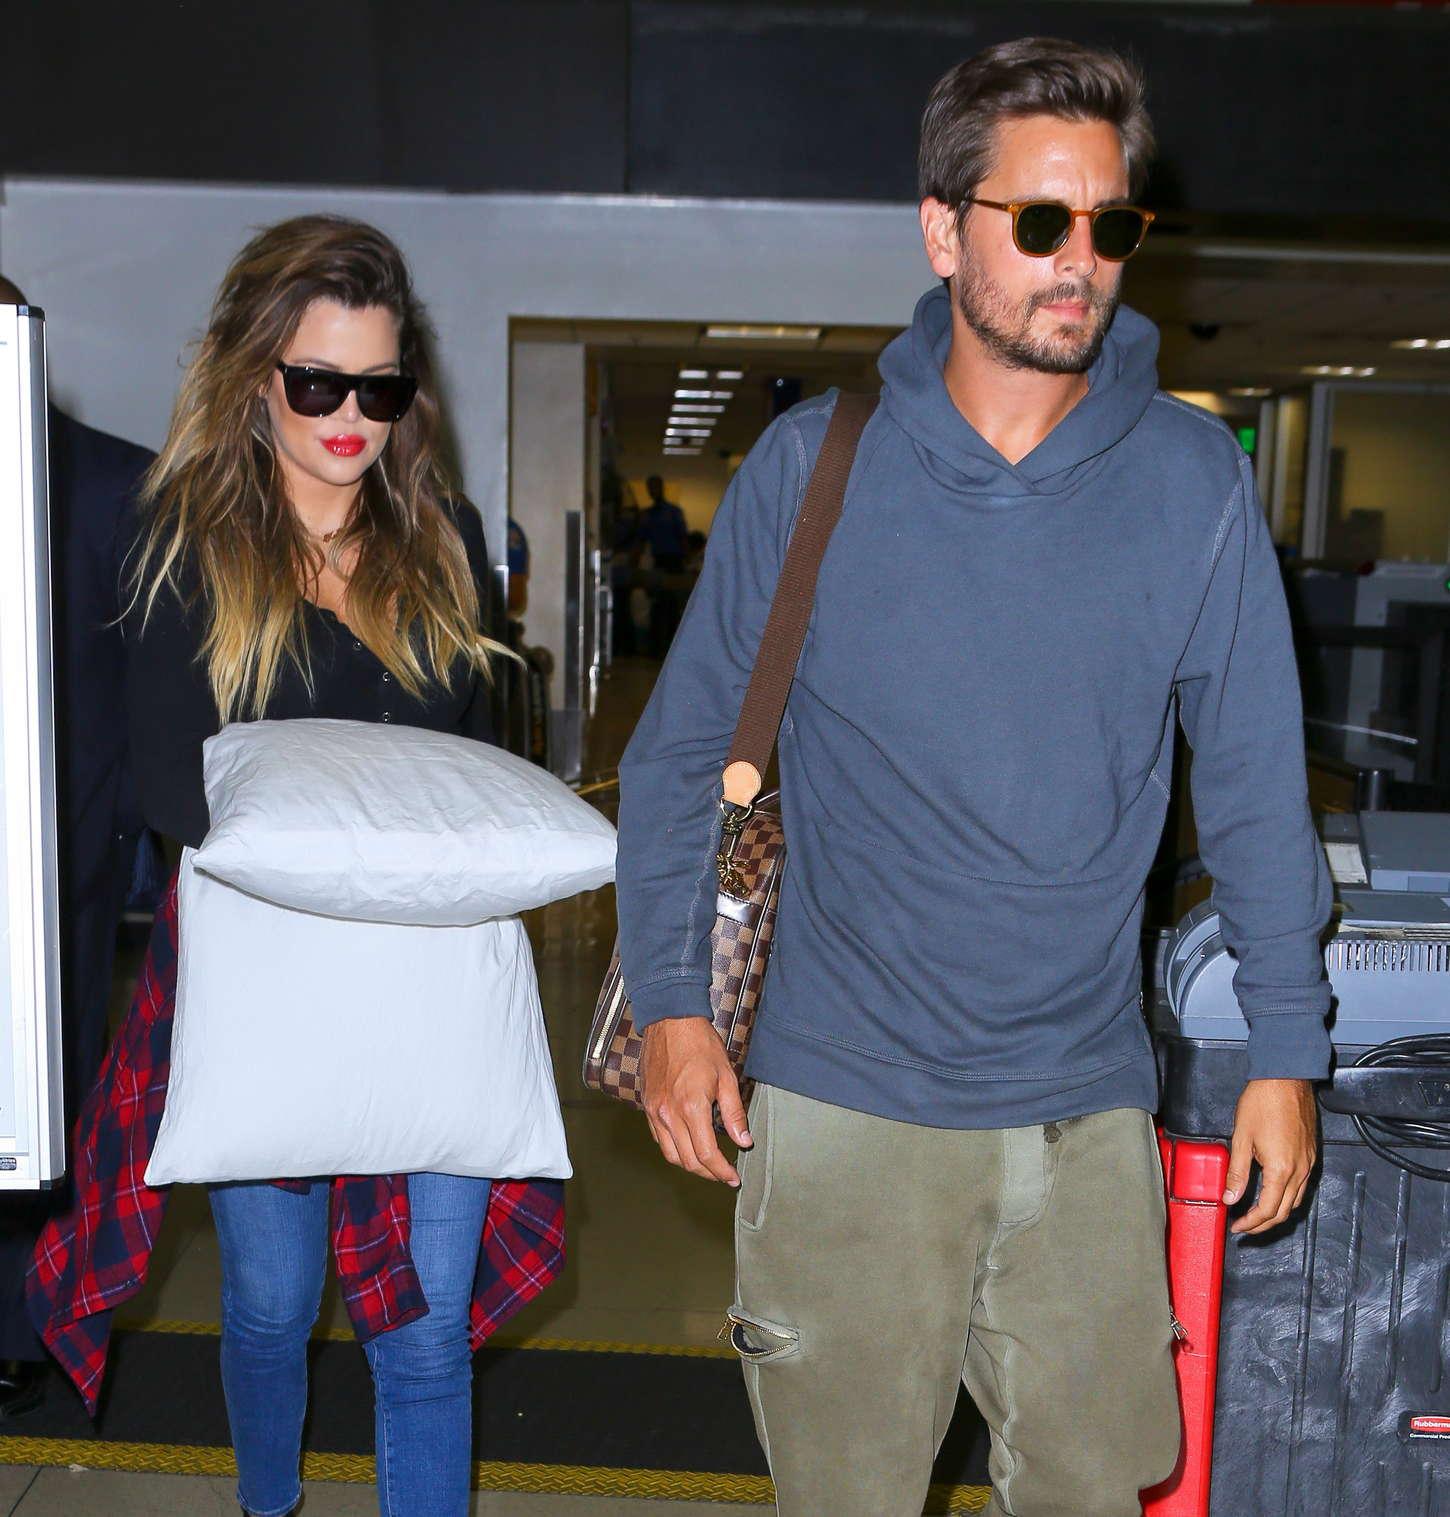 Khloe Kardashian 2014 : Khloe Kardashian with Scott Disick at LAX airport -05